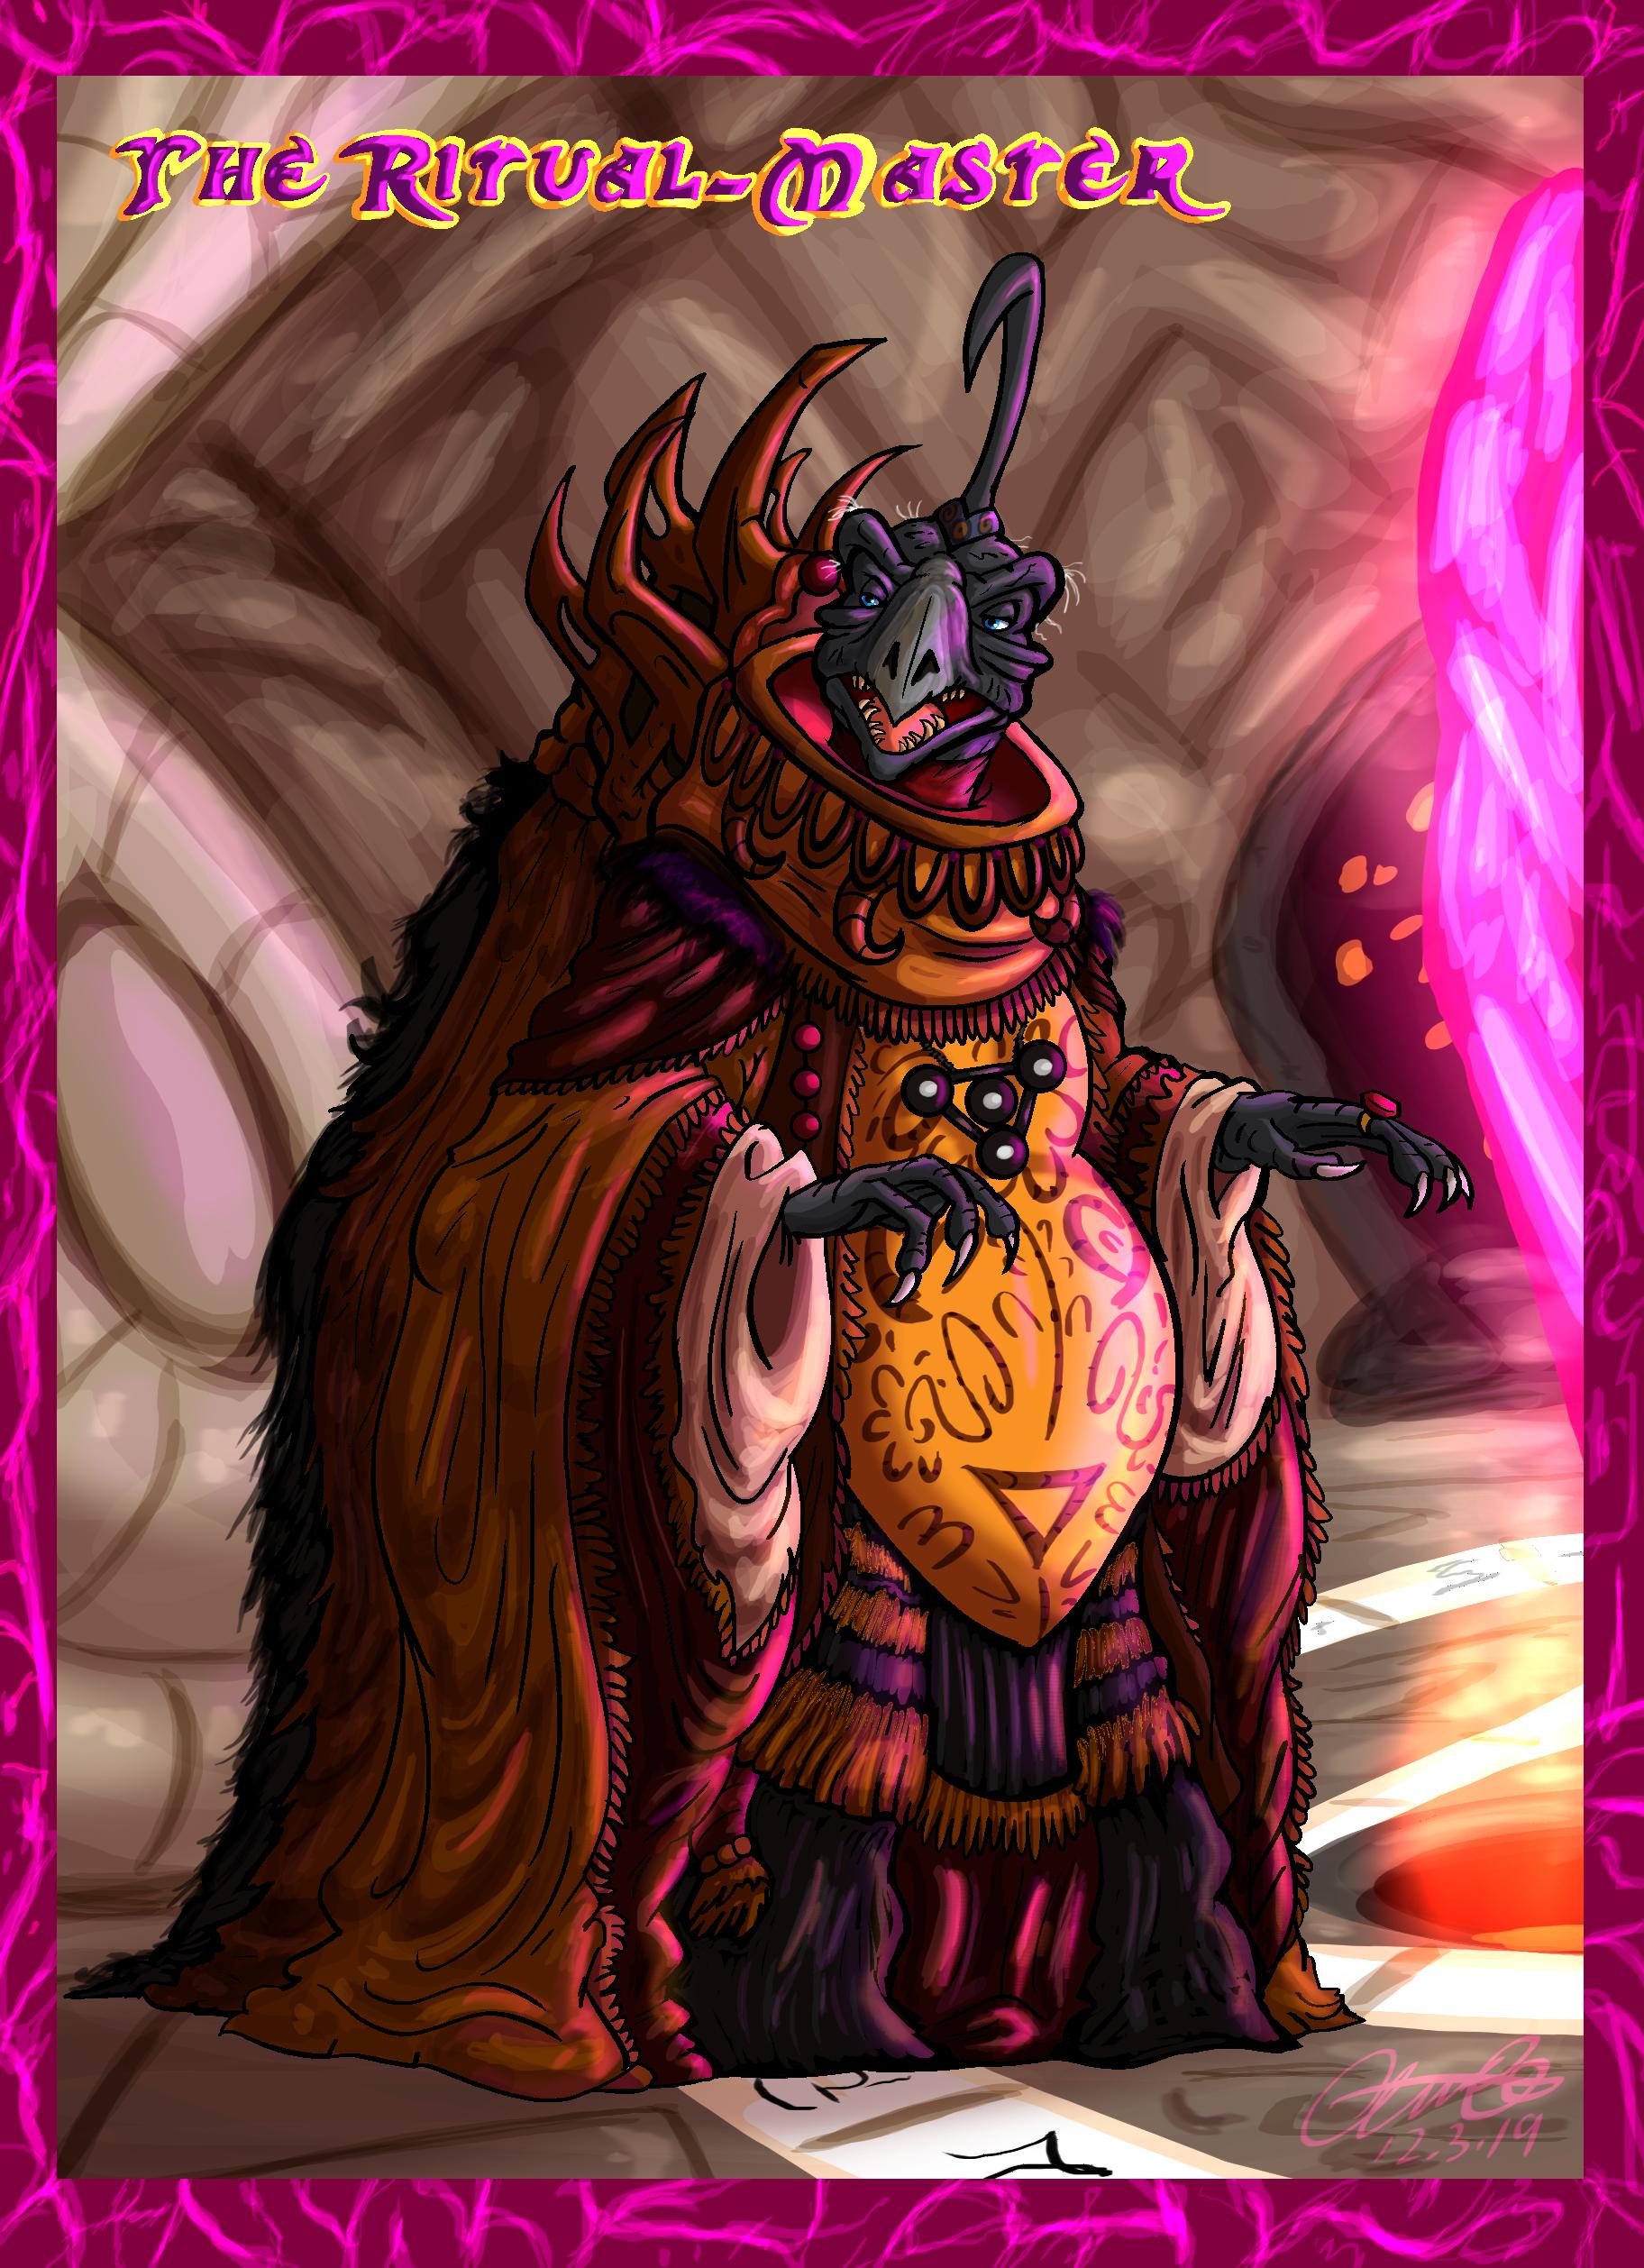 skekZok the Ritual-Master